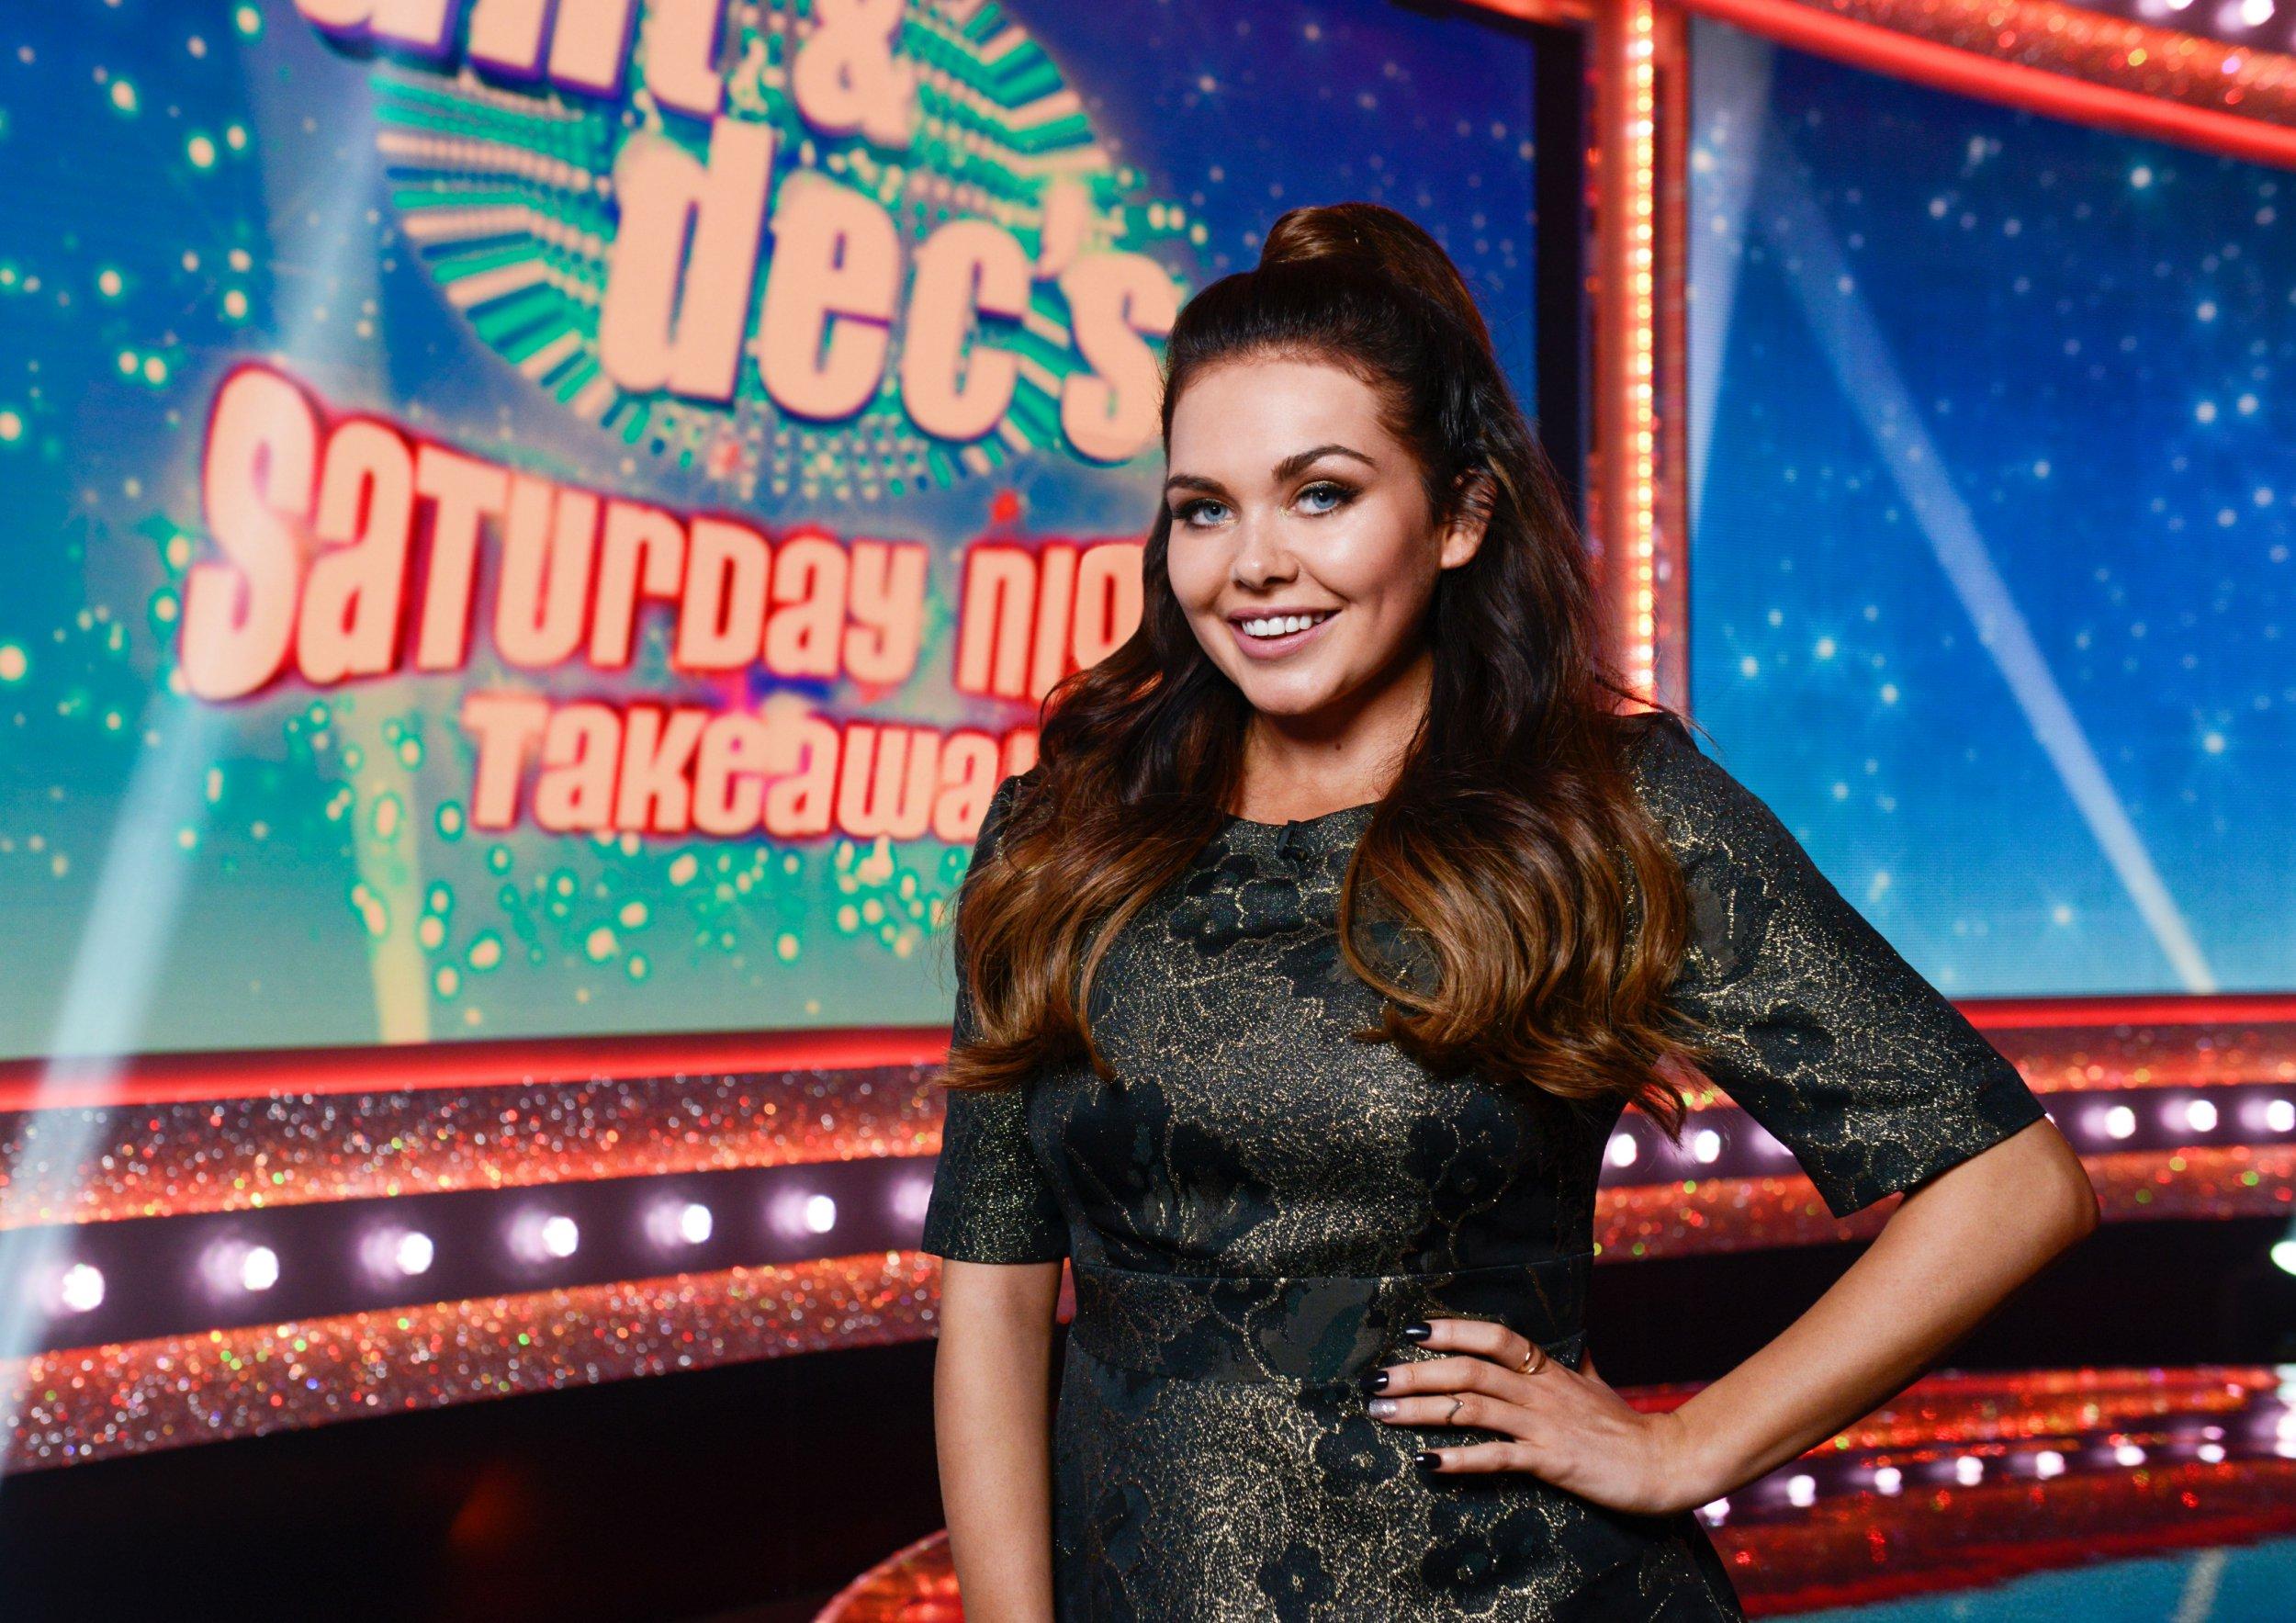 Scarlett Moffatt divides ITV viewers over 'awkward' Saturday Night Takeaway stint